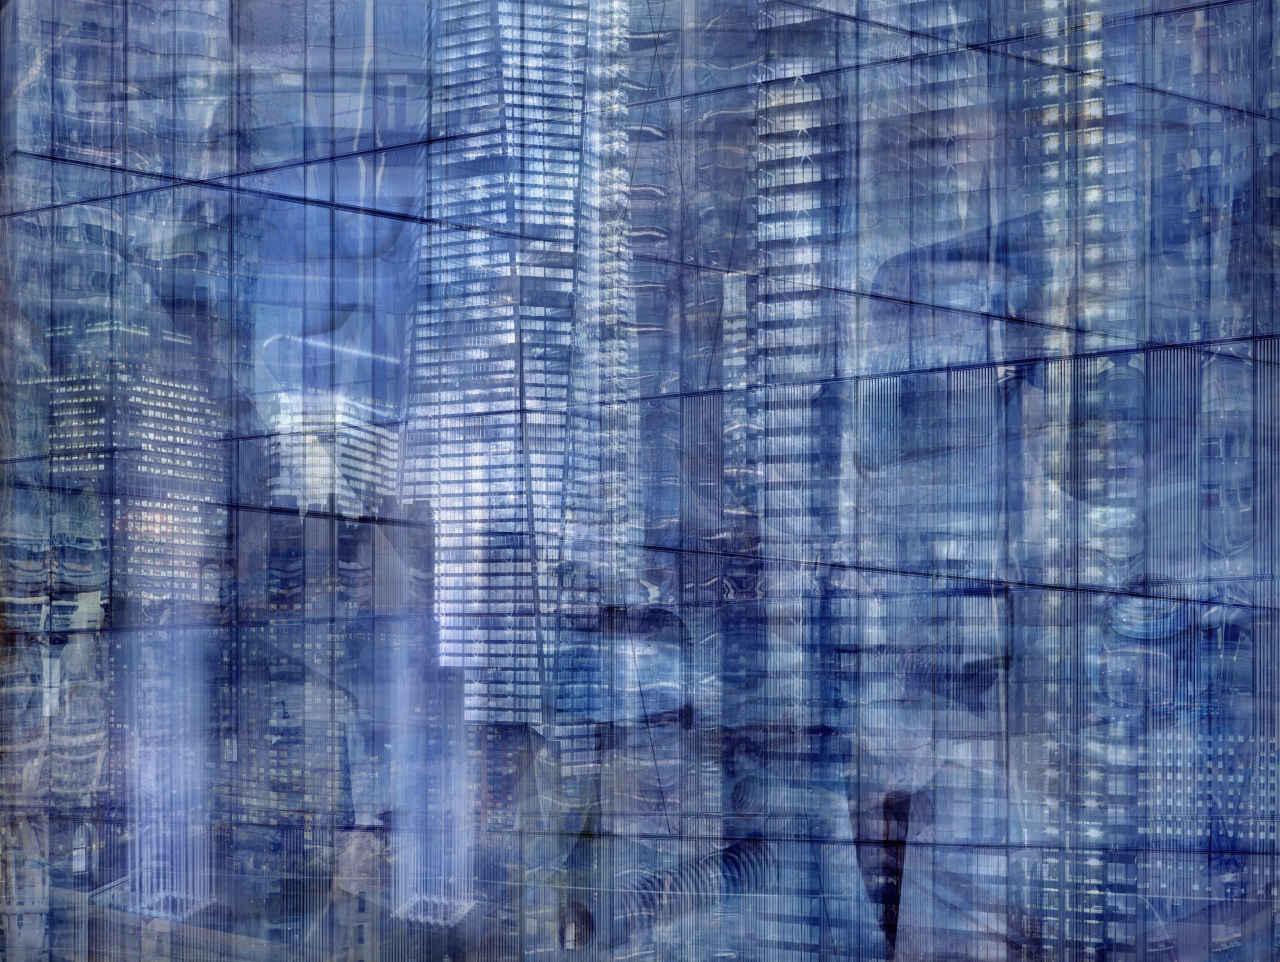 shai-kremer-photography-concrete-abstract 15-world-trade-center-2001-2013